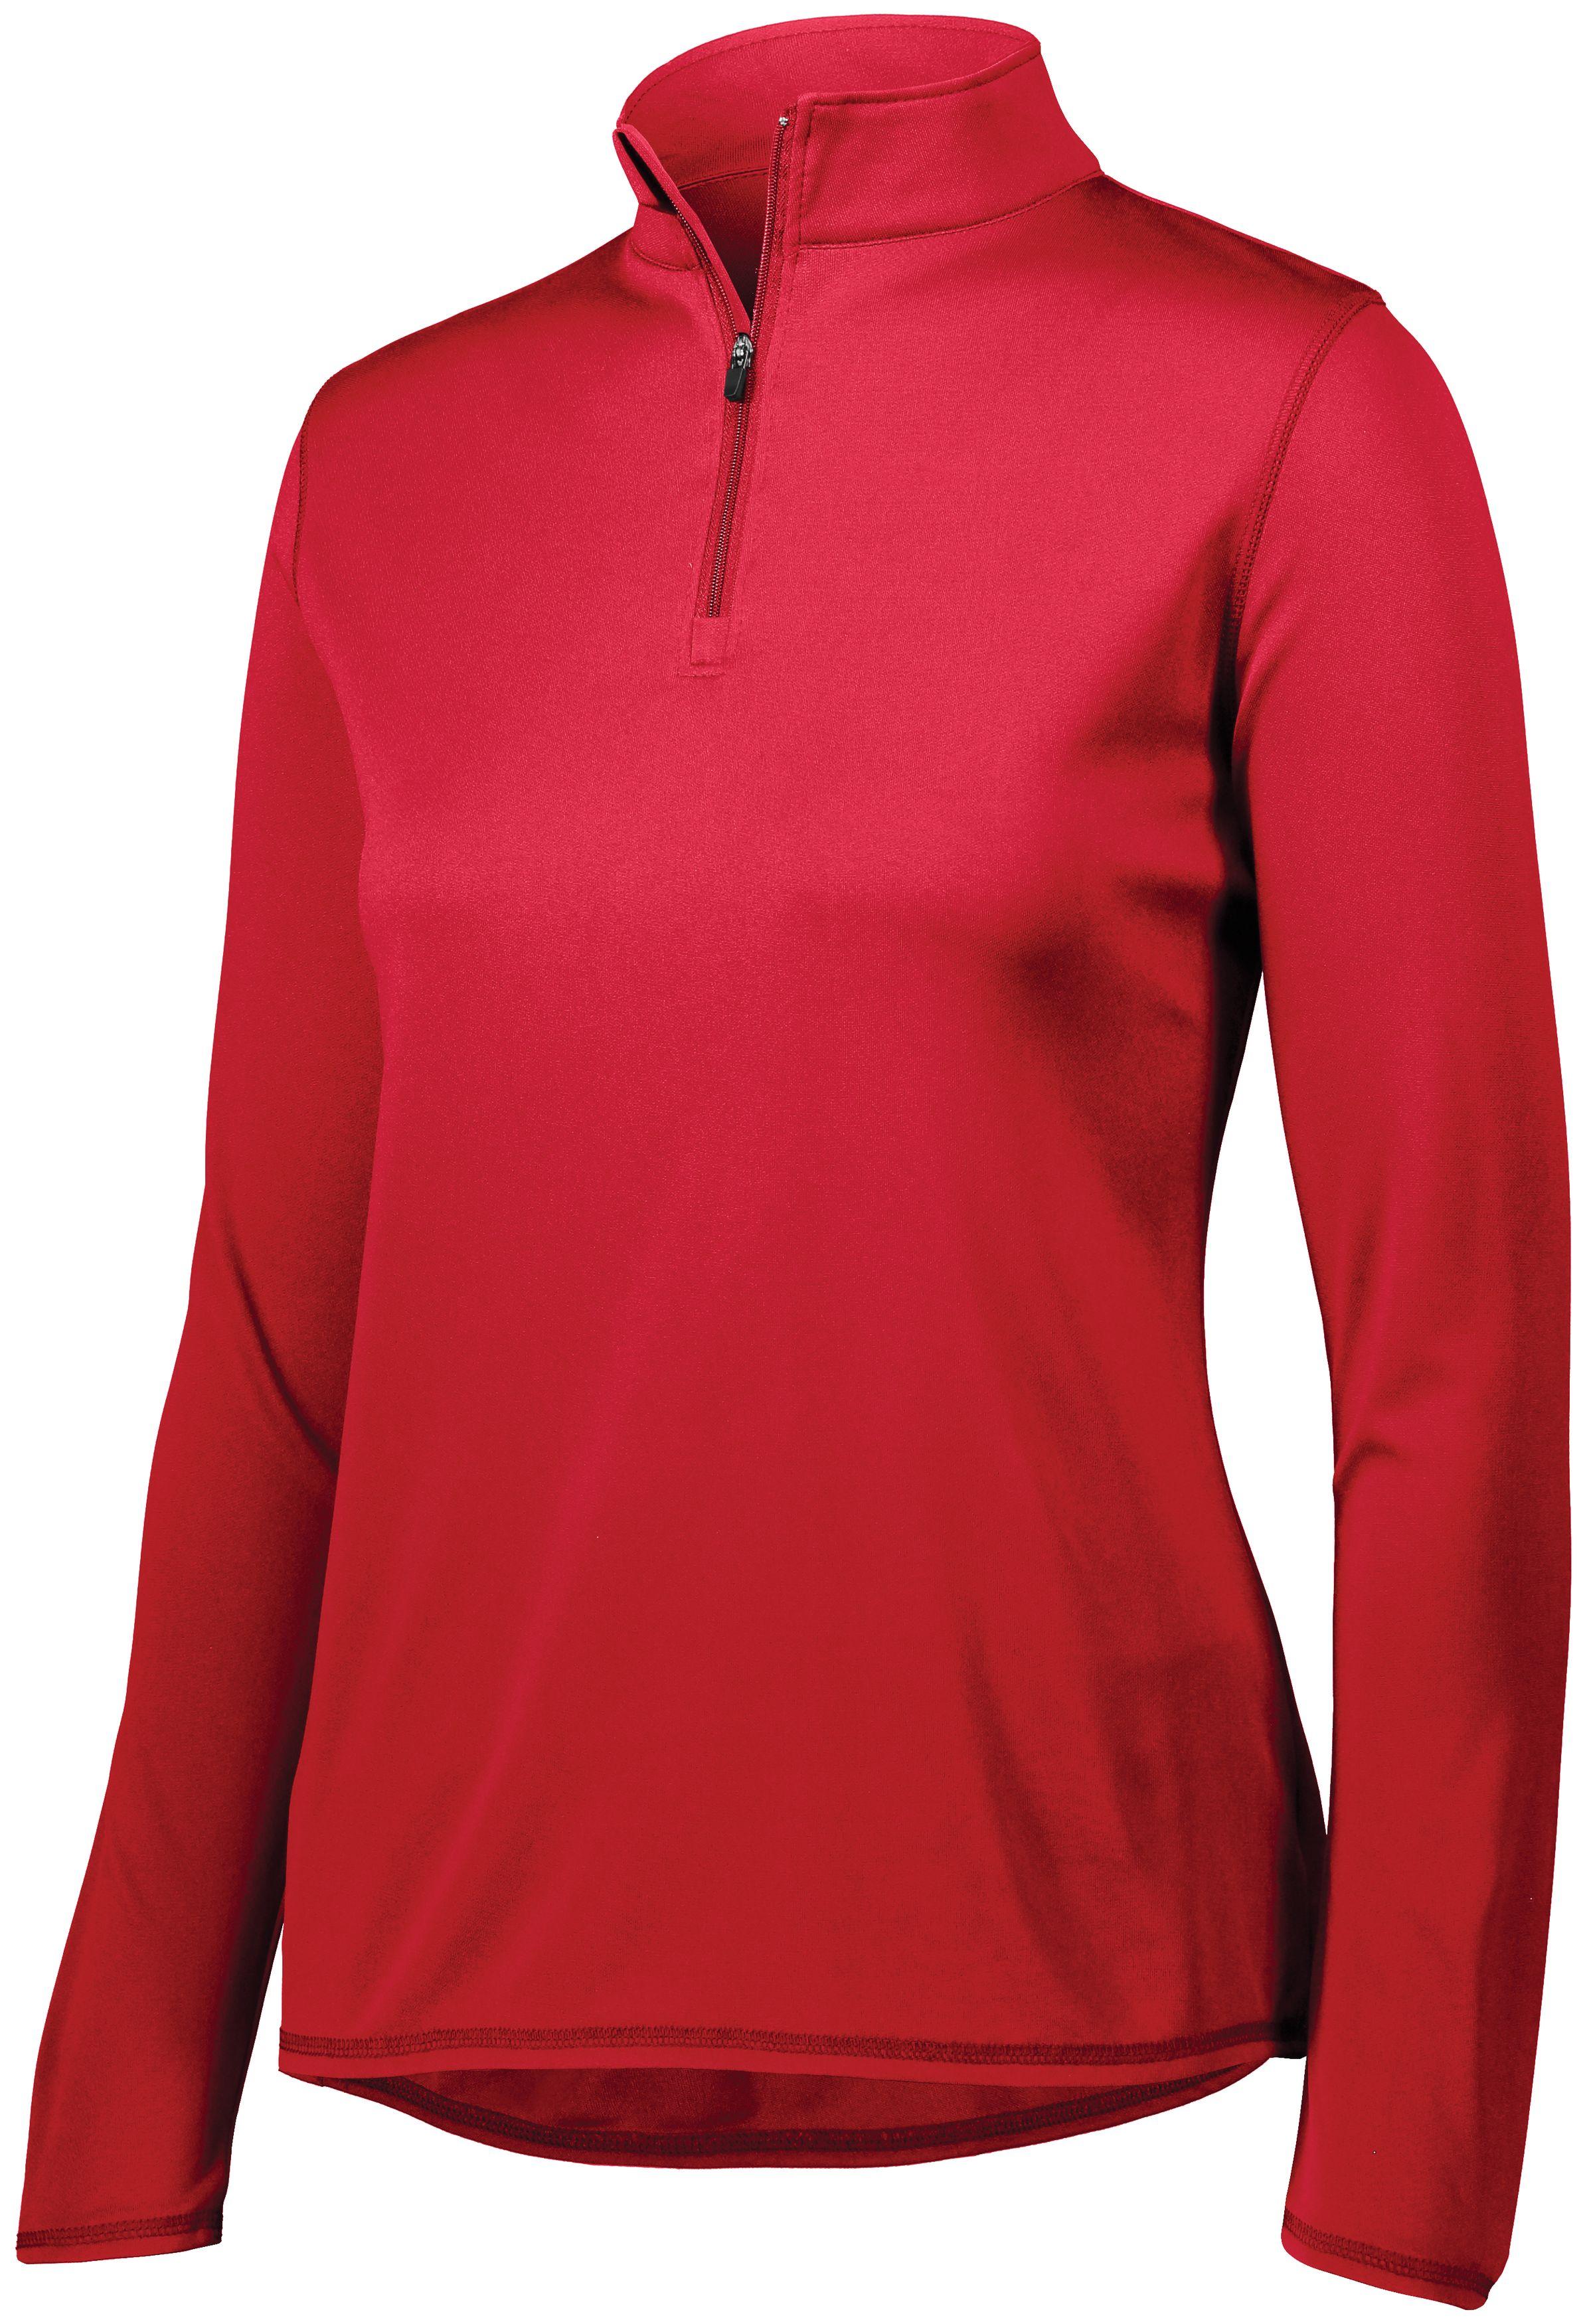 Ladies Attain Wicking 1/4 Zip Pullover - RED